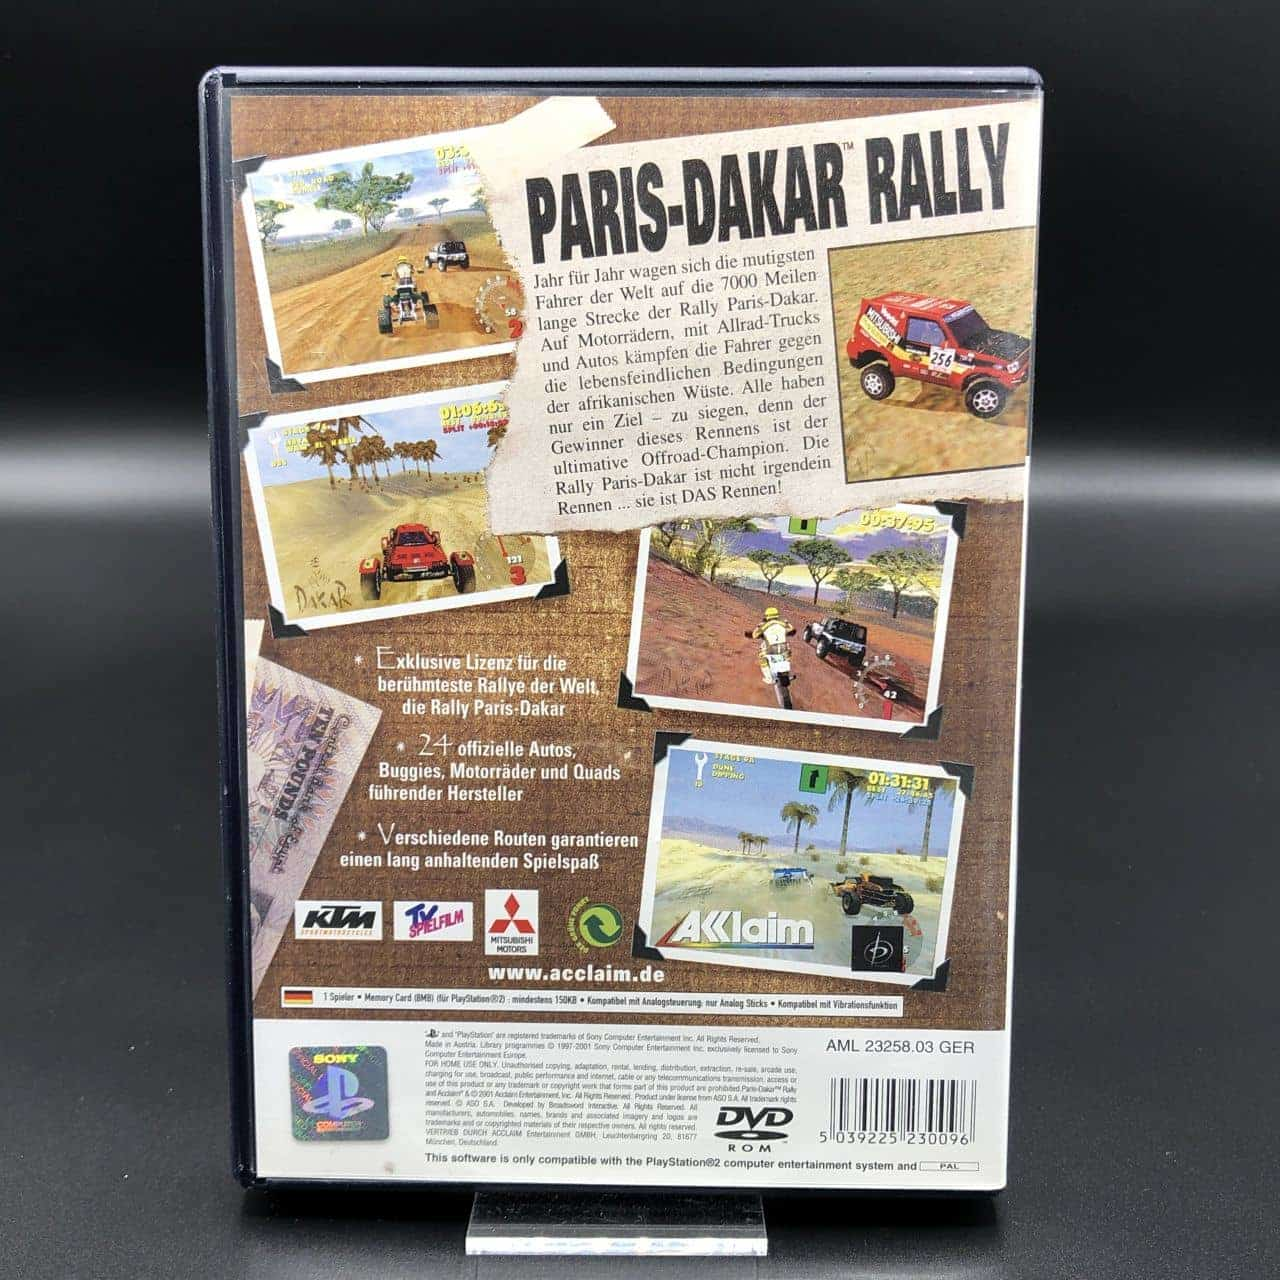 PS2 Paris-Dakar Rally (Komplett) (Gebrauchsspuren) Sony PlayStation 2